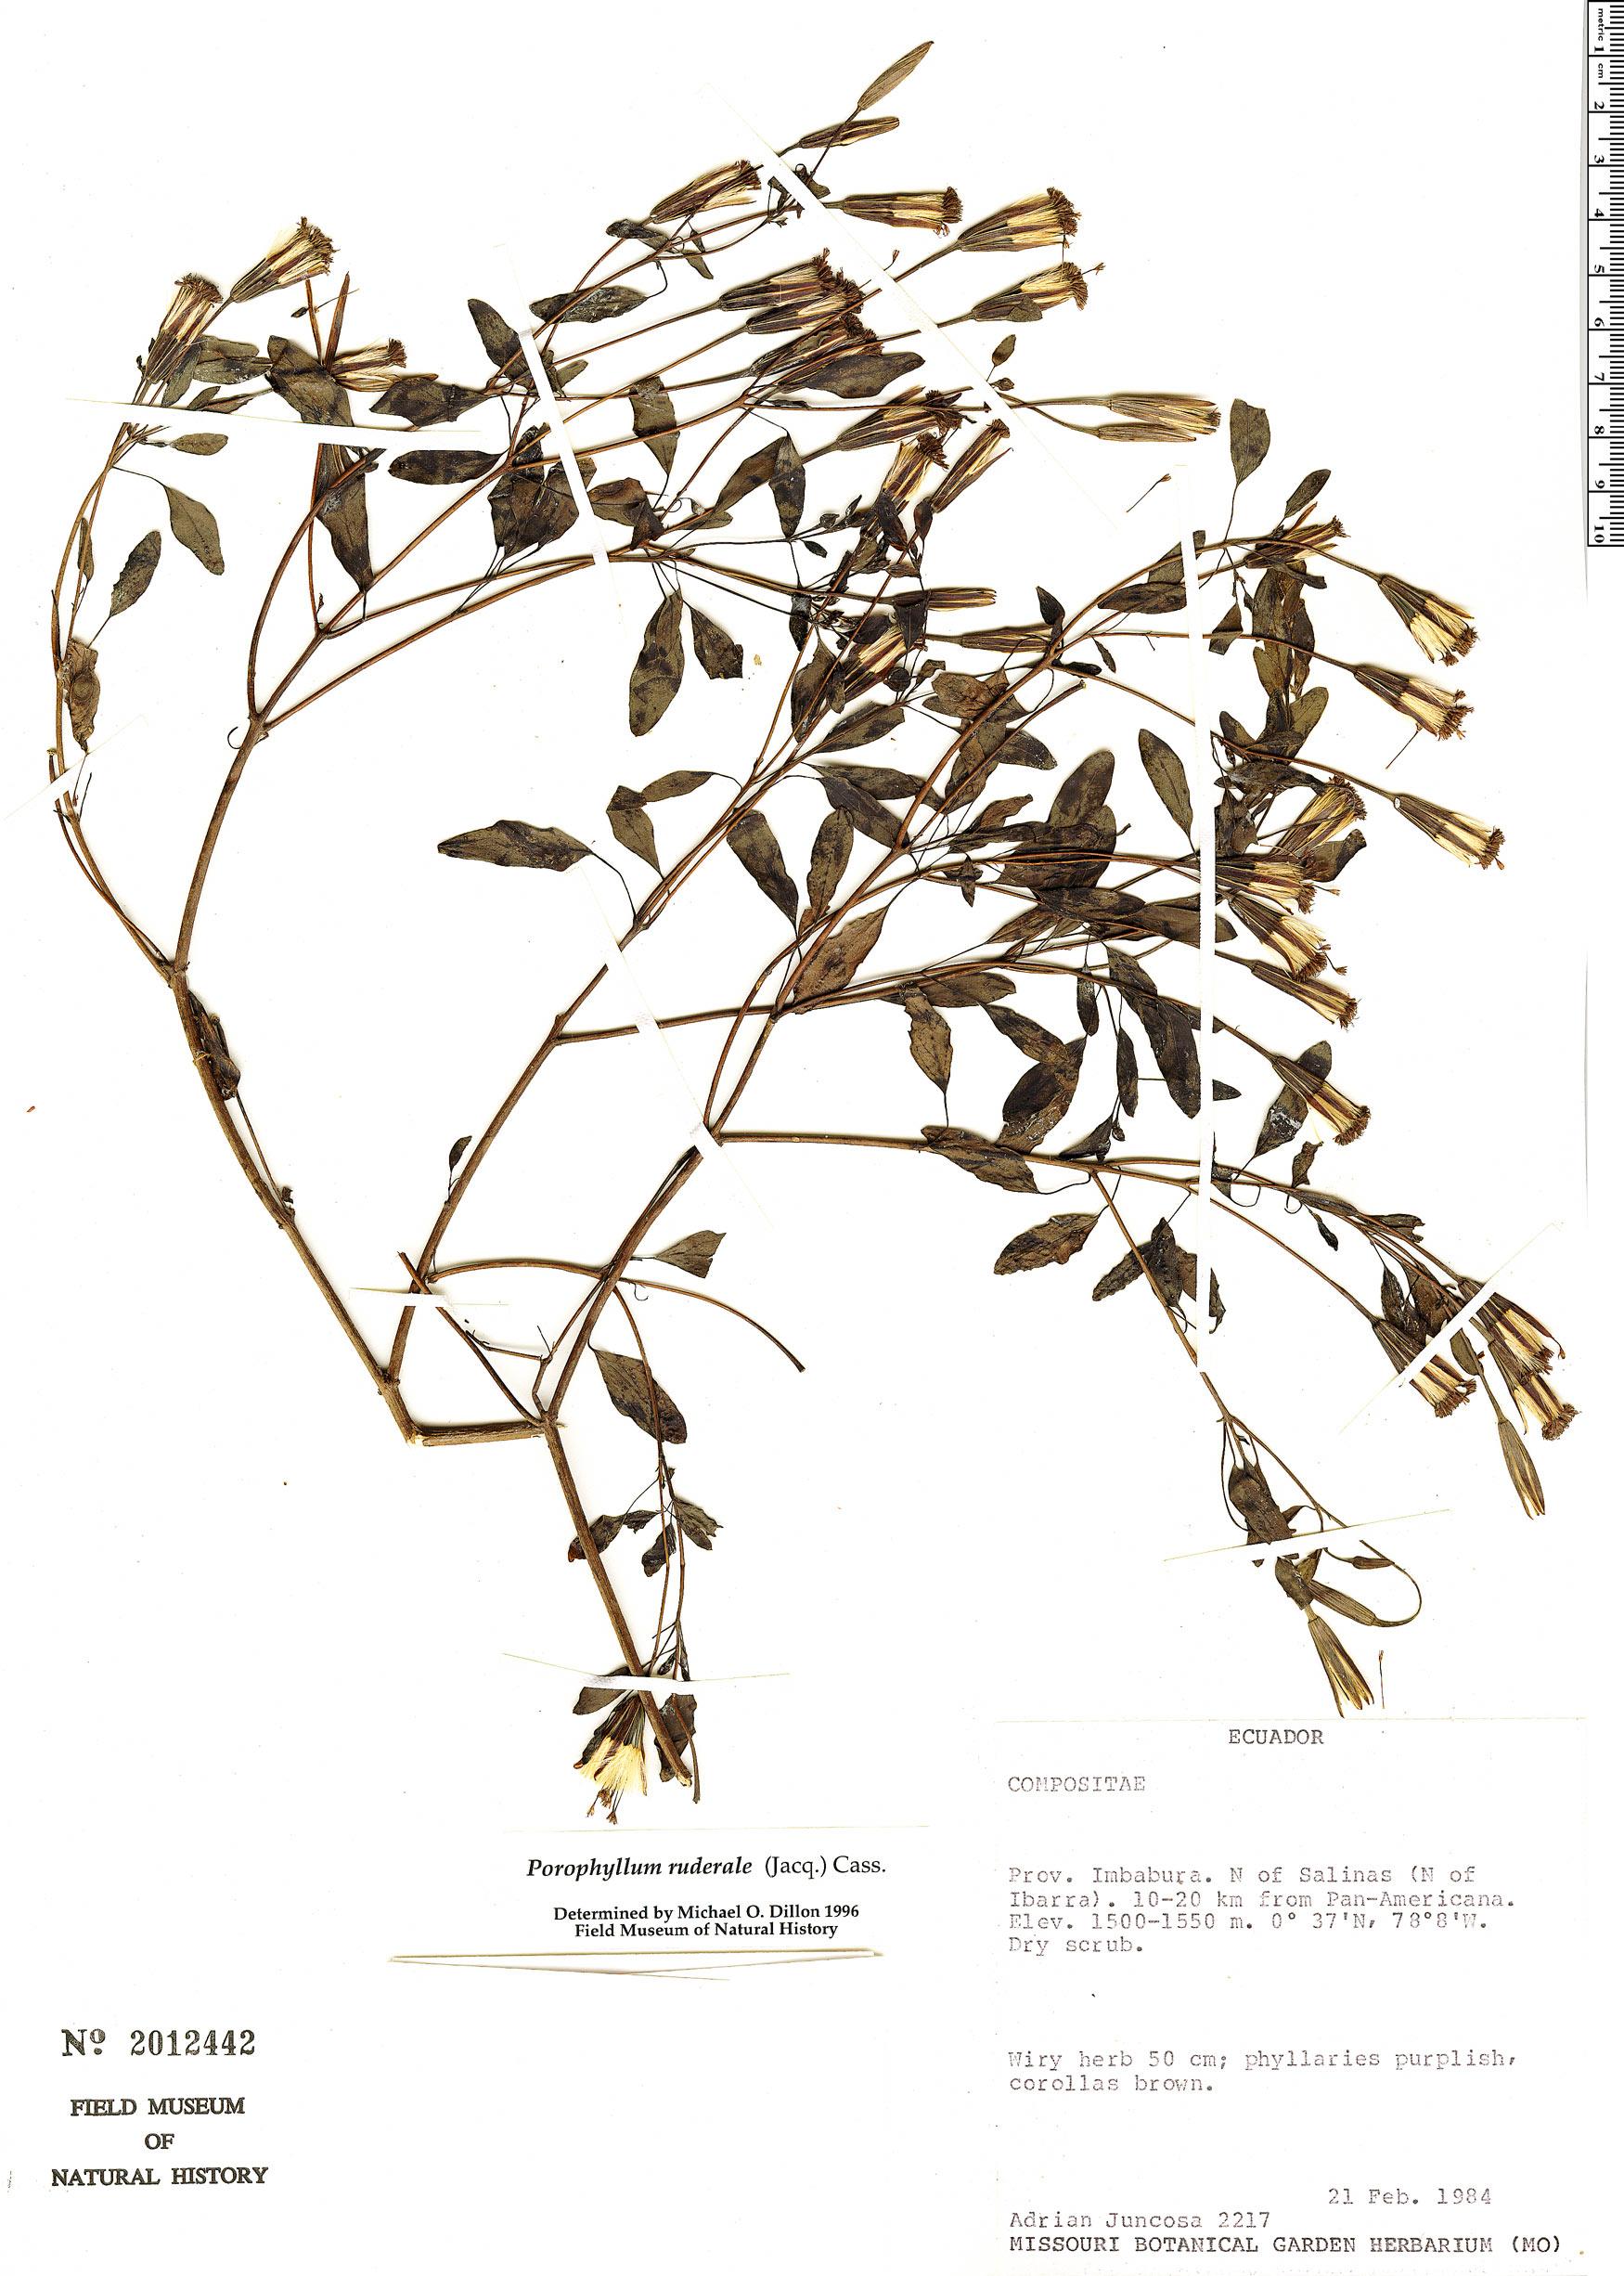 Espécimen: Porophyllum ruderale